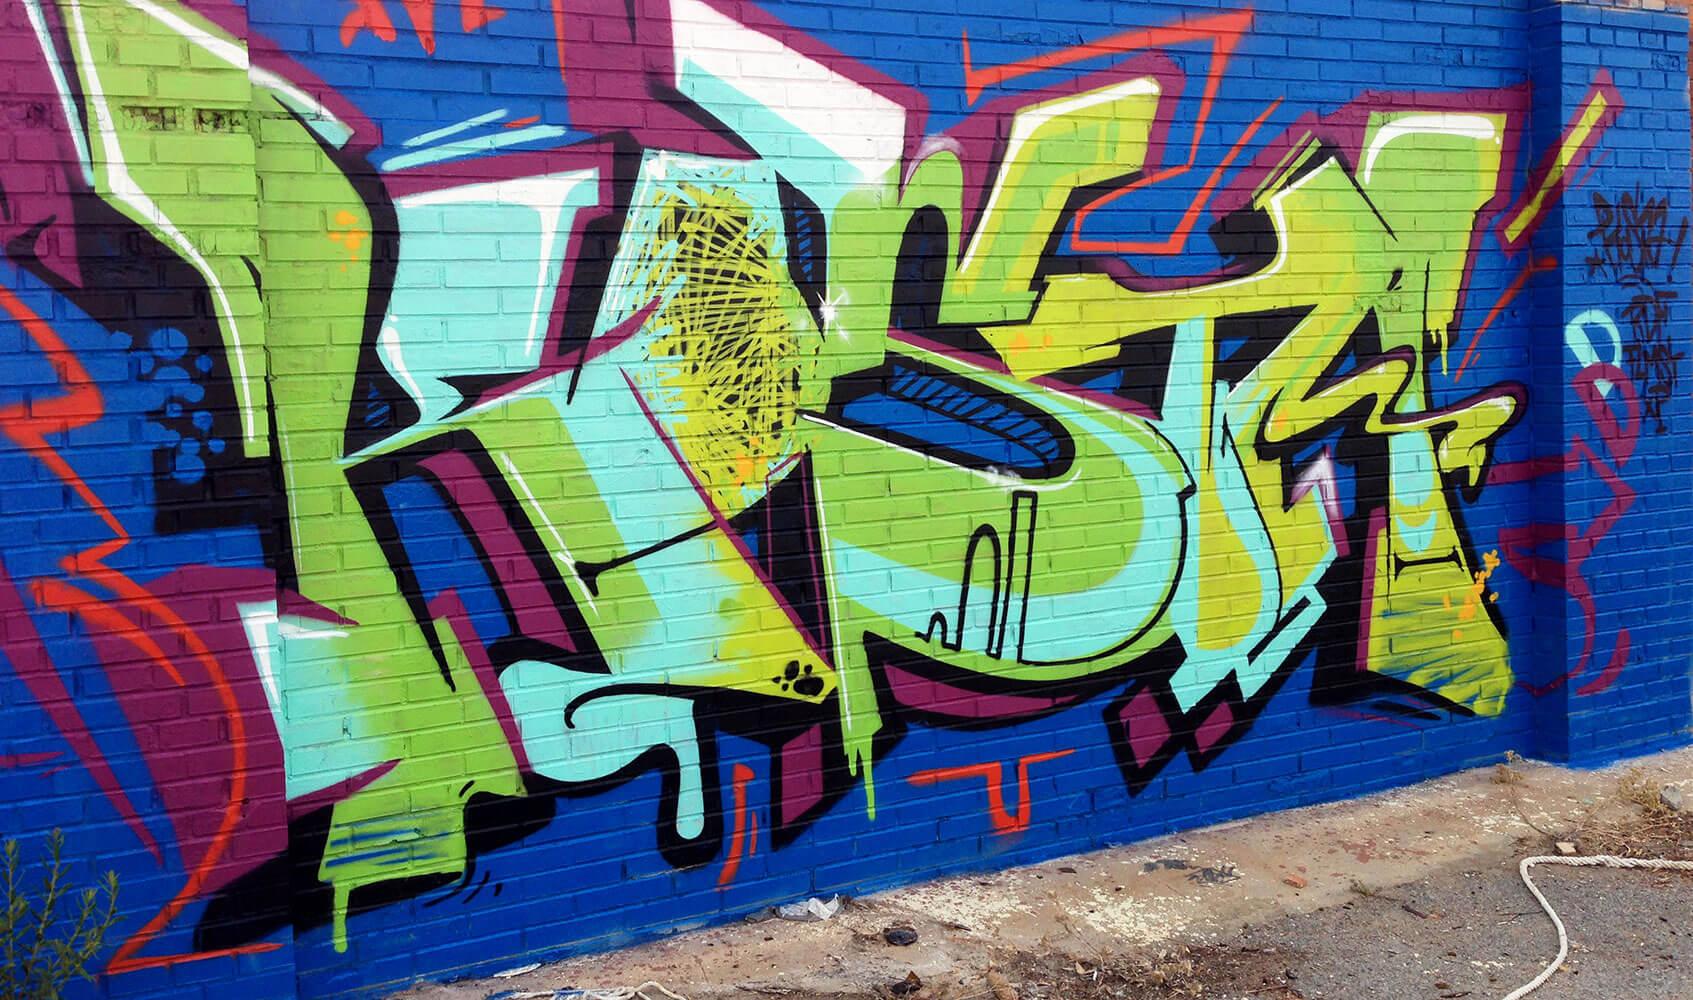 Graffiti in malaga kosta by artist max kosta 2015